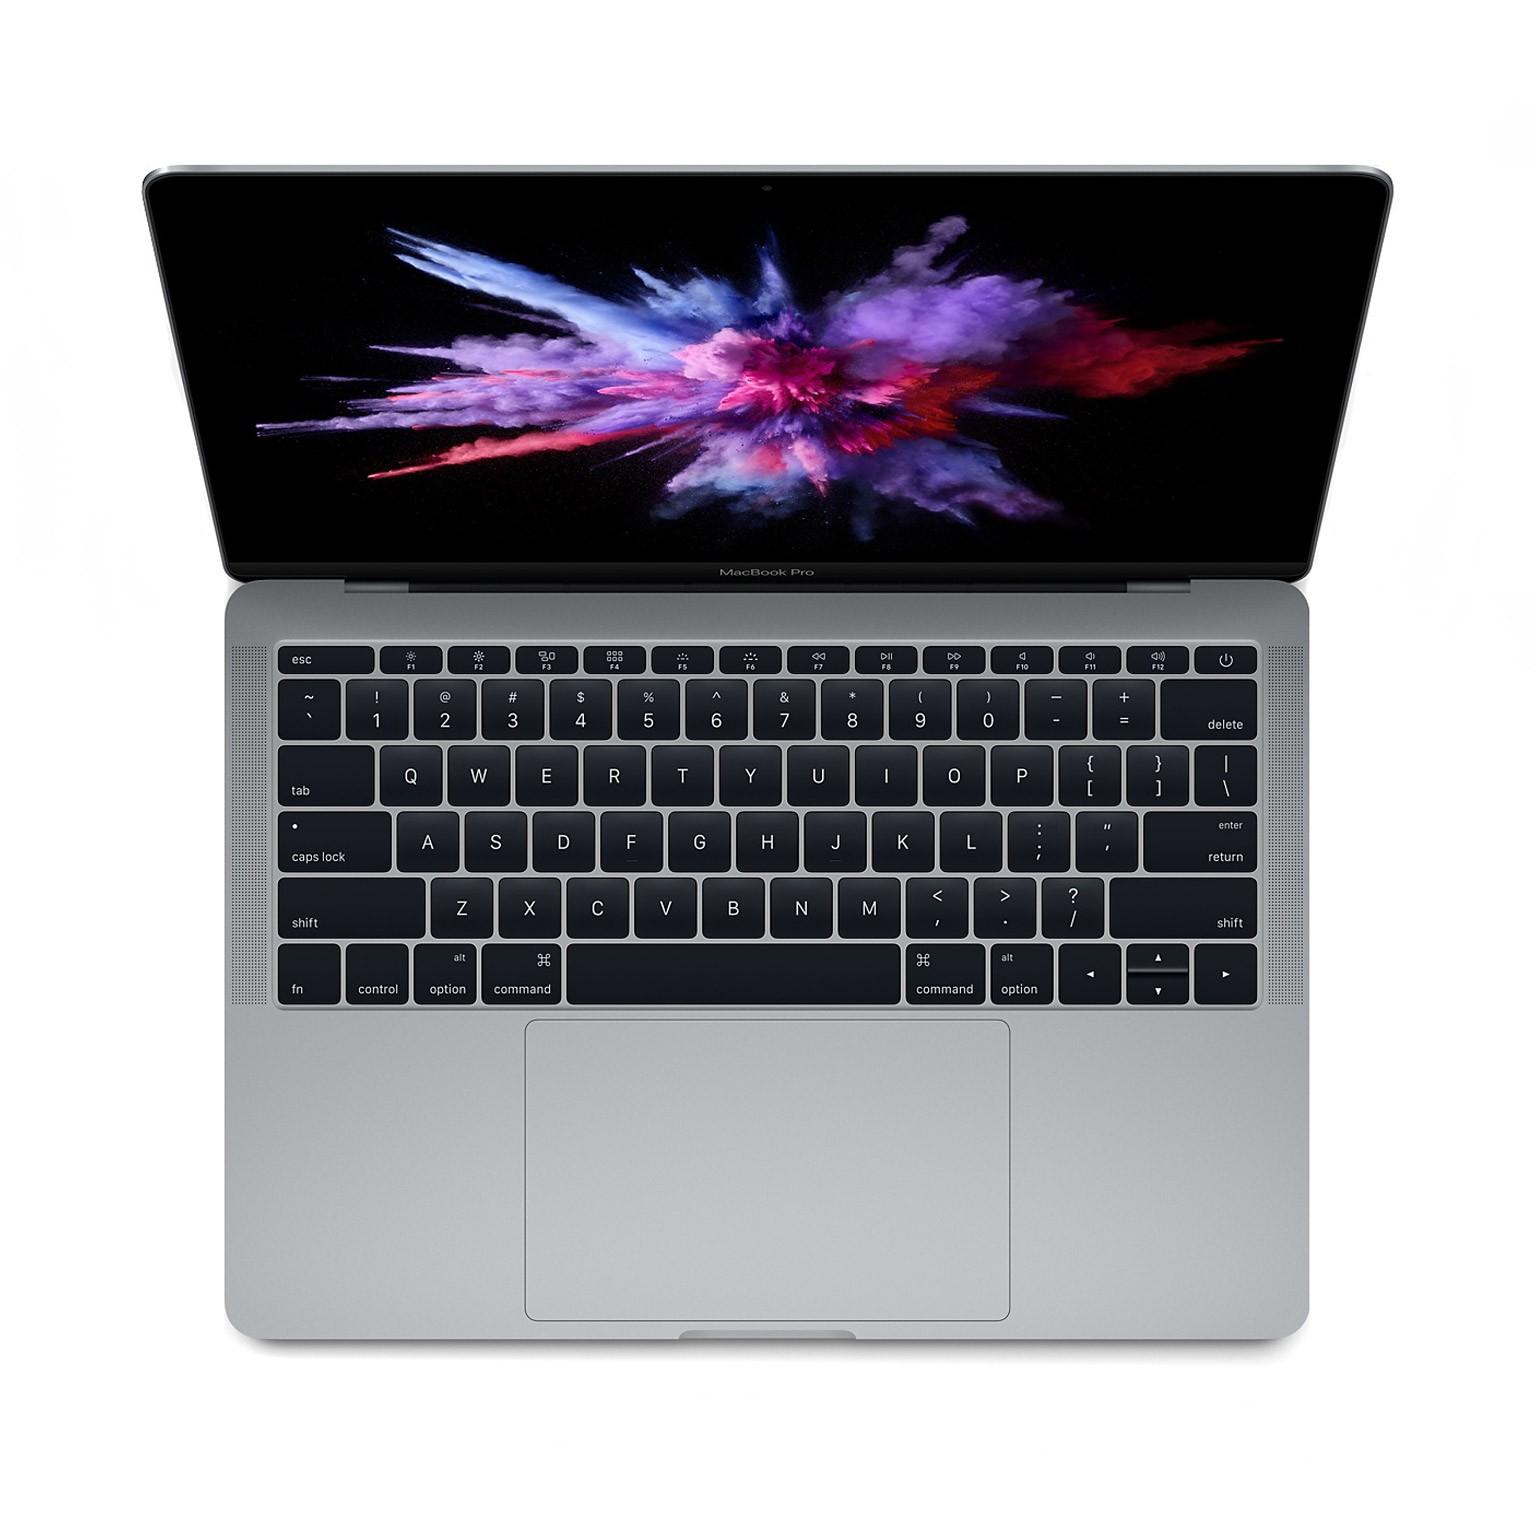 "Тъмносив Apple MacBook Pro 13"" с двуядрен Intel Core i5 процесор, памет 128GB - българска клавиатура"